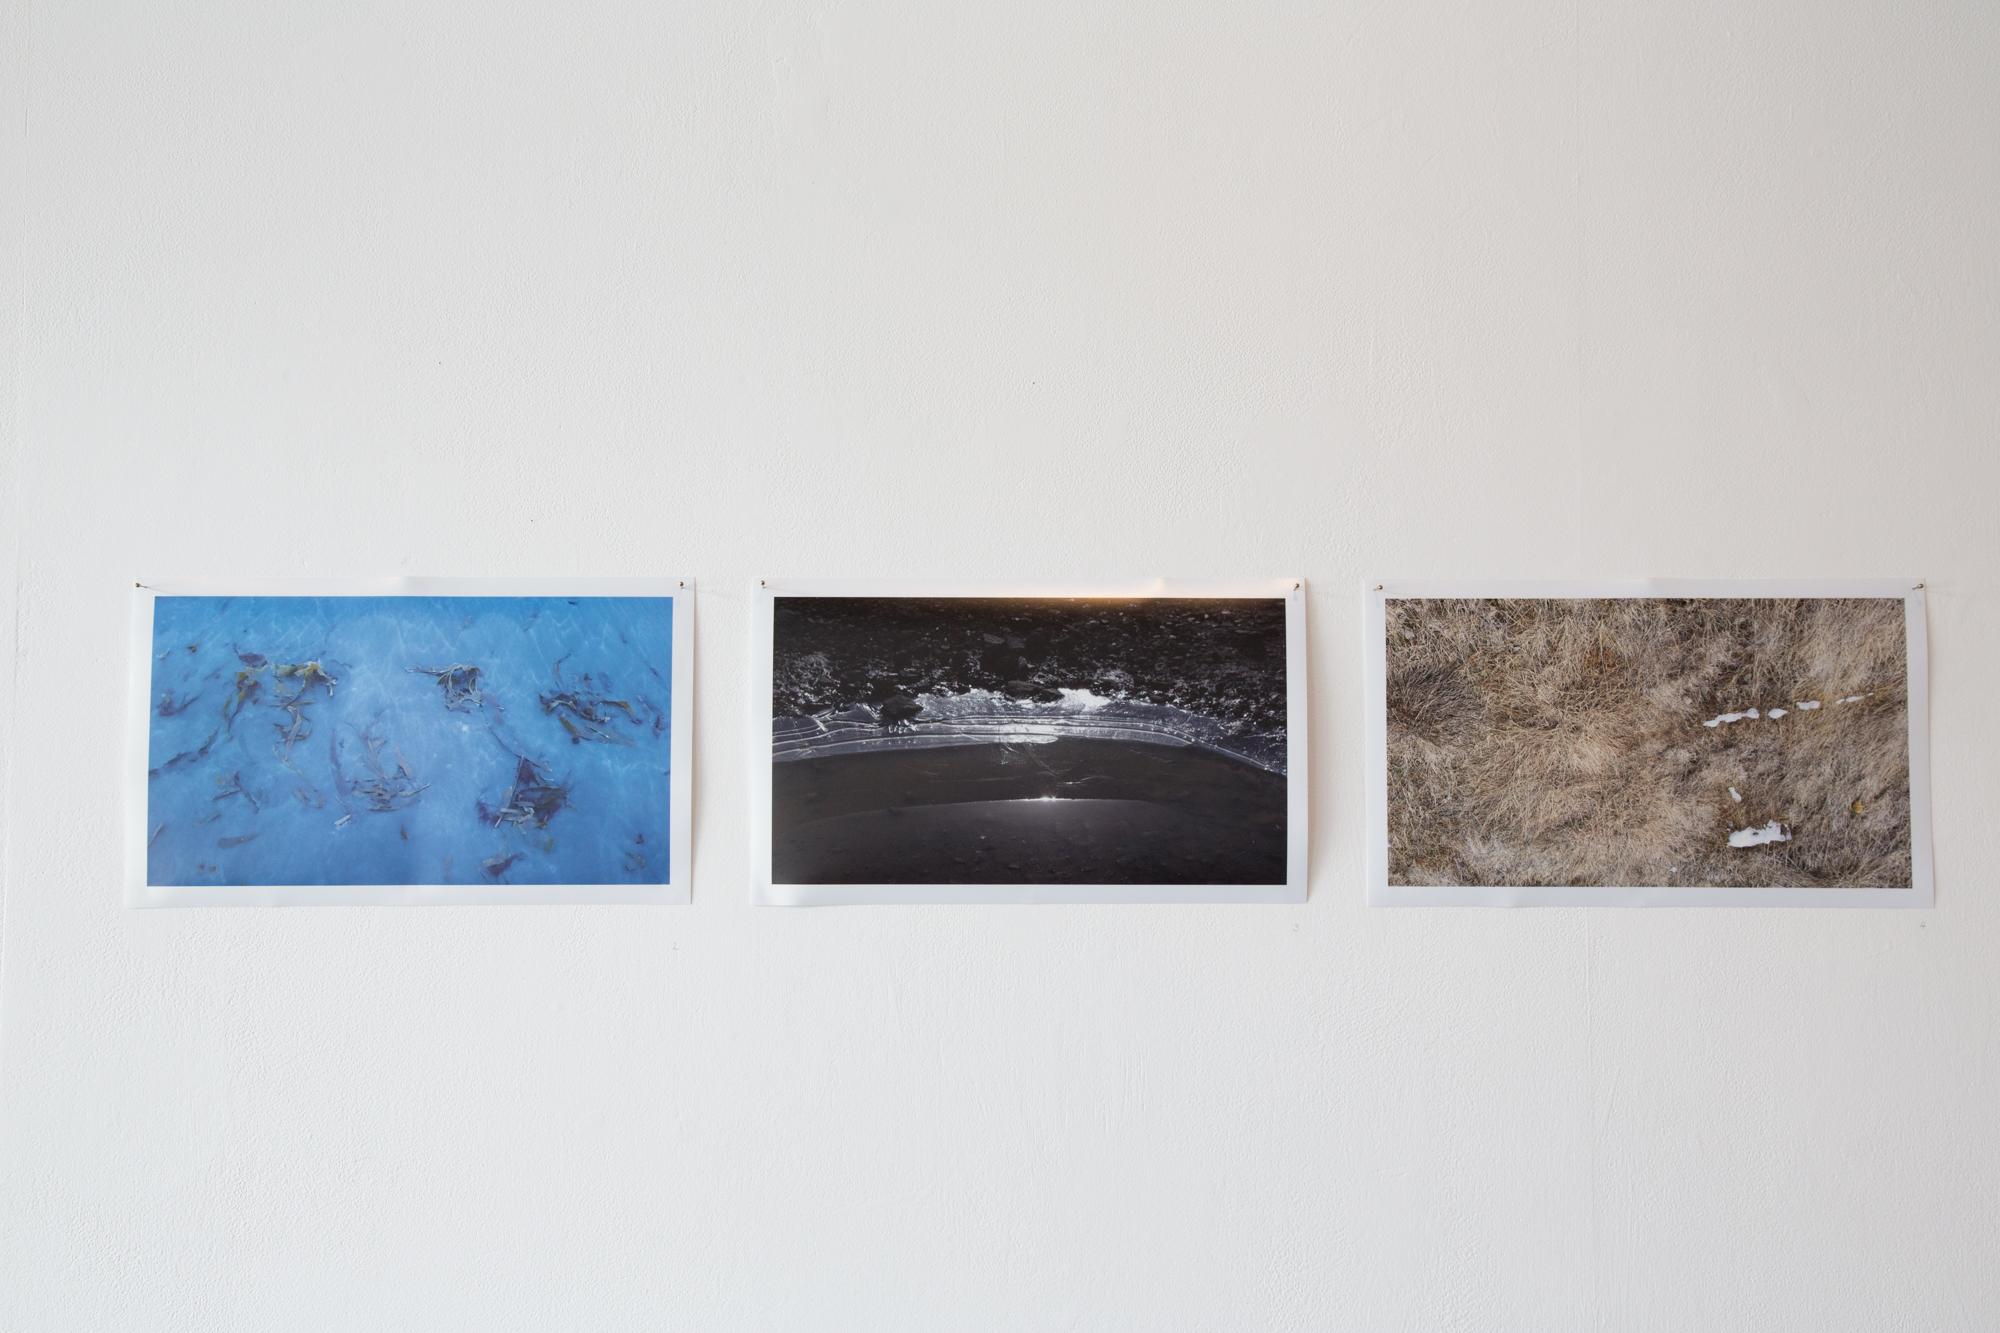 Seaweed & Sand (Ólafsfjörður)  2016, Giclee print on metallic paper.   Ice & Stone (Ólafsfjörður)   2016, Giclee print on metallic paper.   Ice melting (Ólafsfjörður)  2016, Giclee print on metallic paper.  Photograph by Yvonne Doherty at Cirrus Photography.